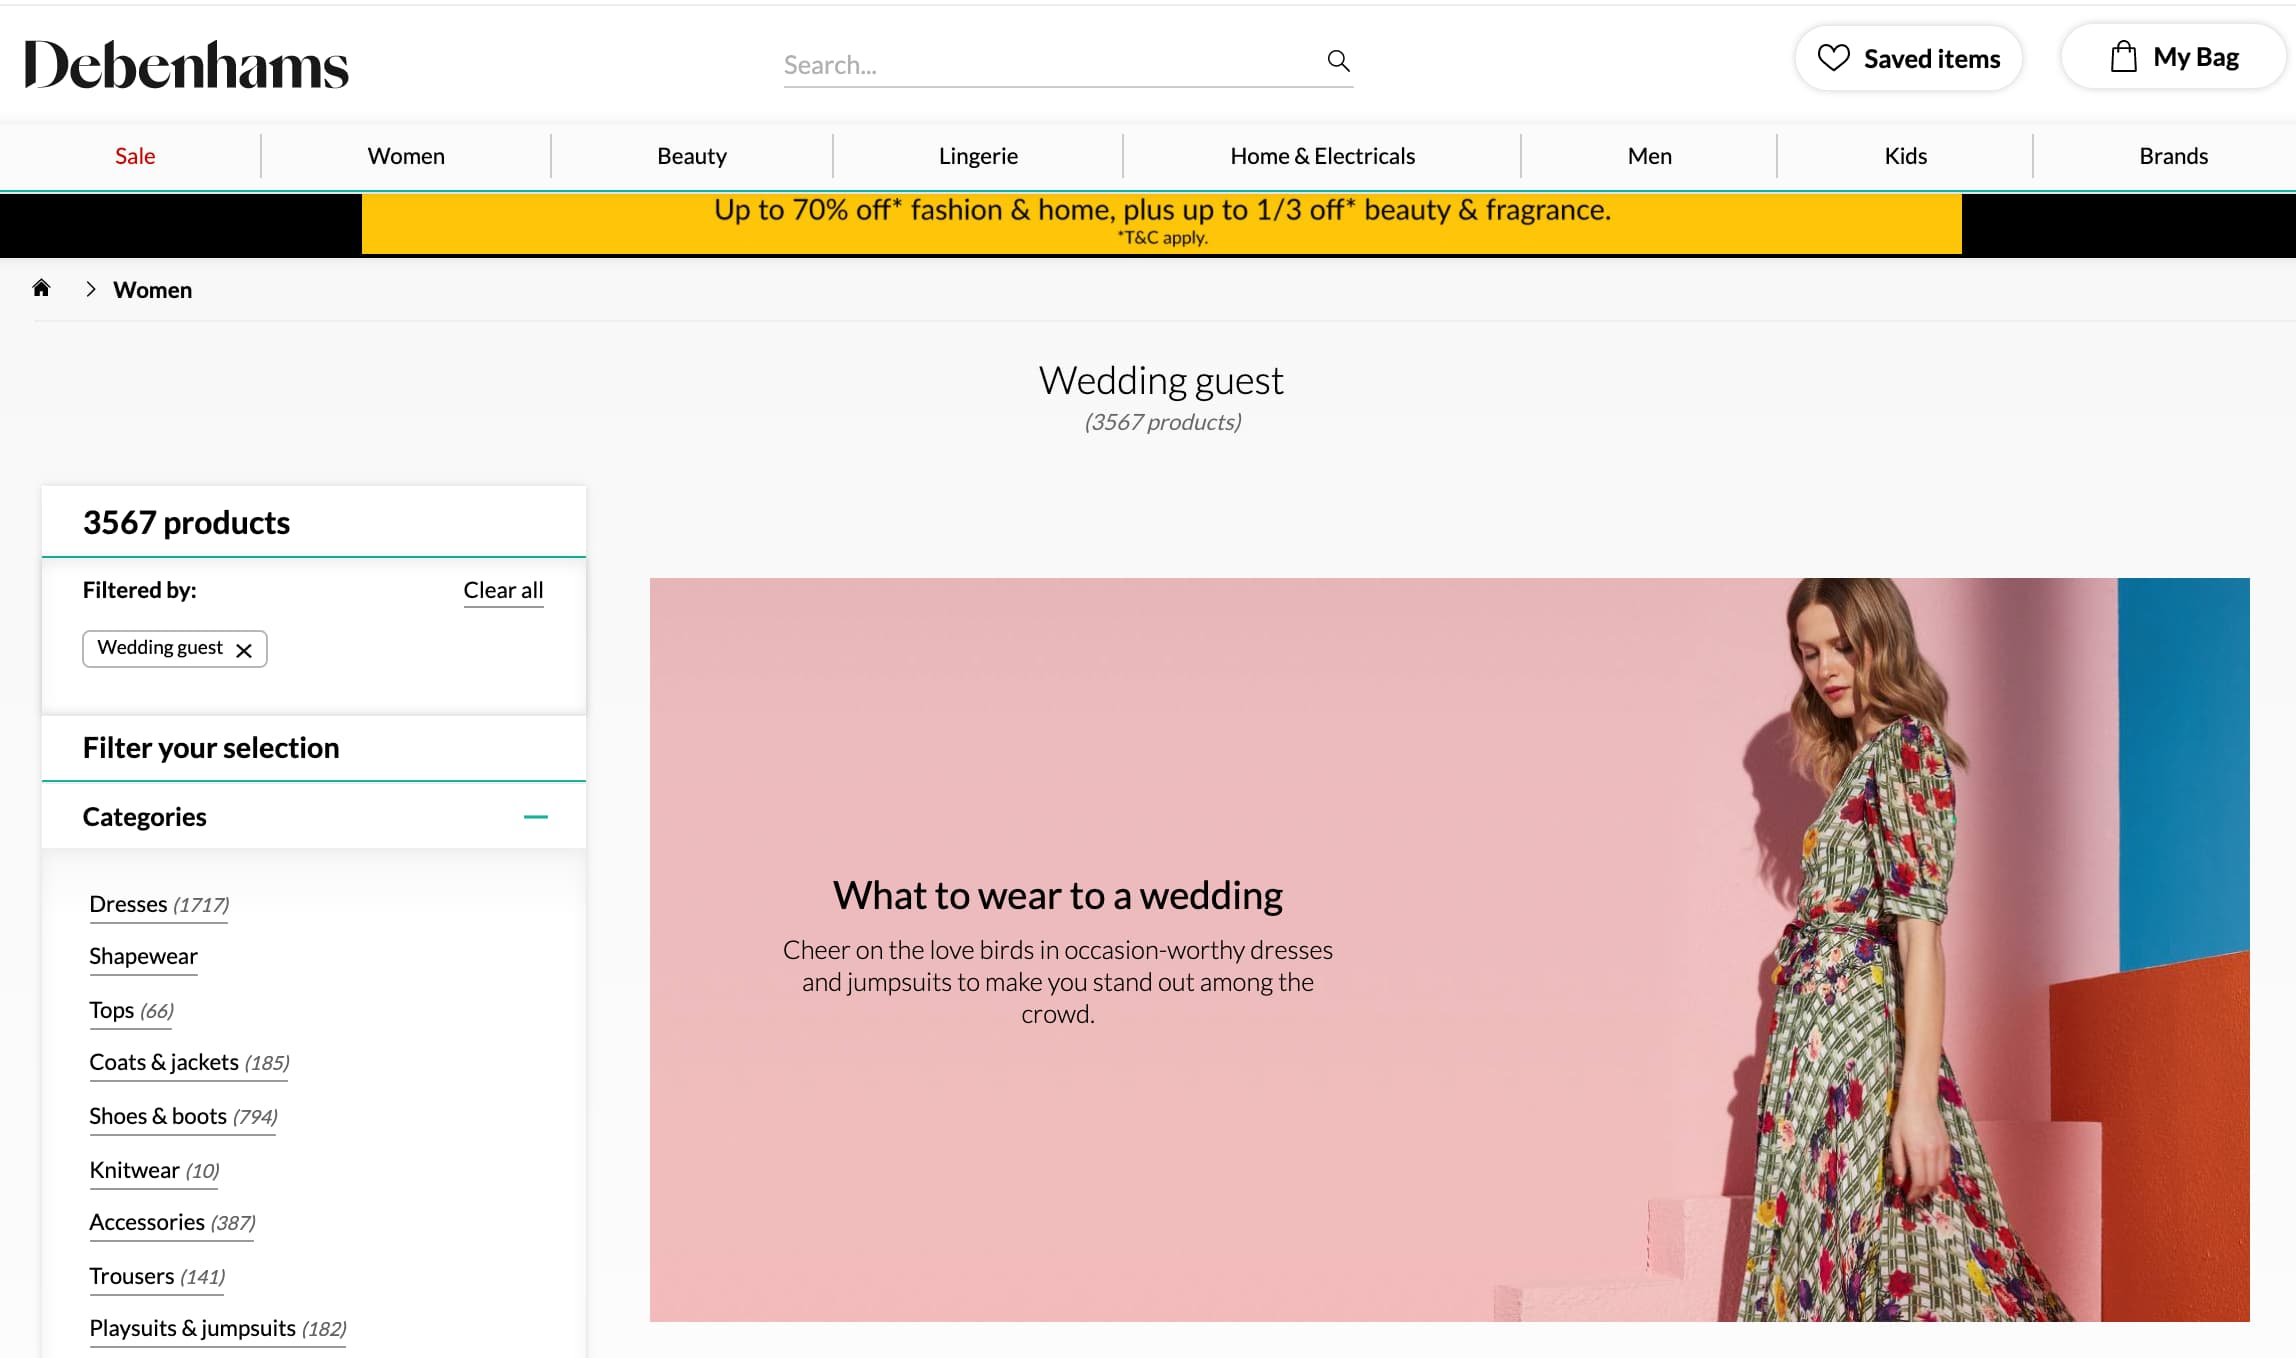 debenhams what to wear to a wedding sample screen